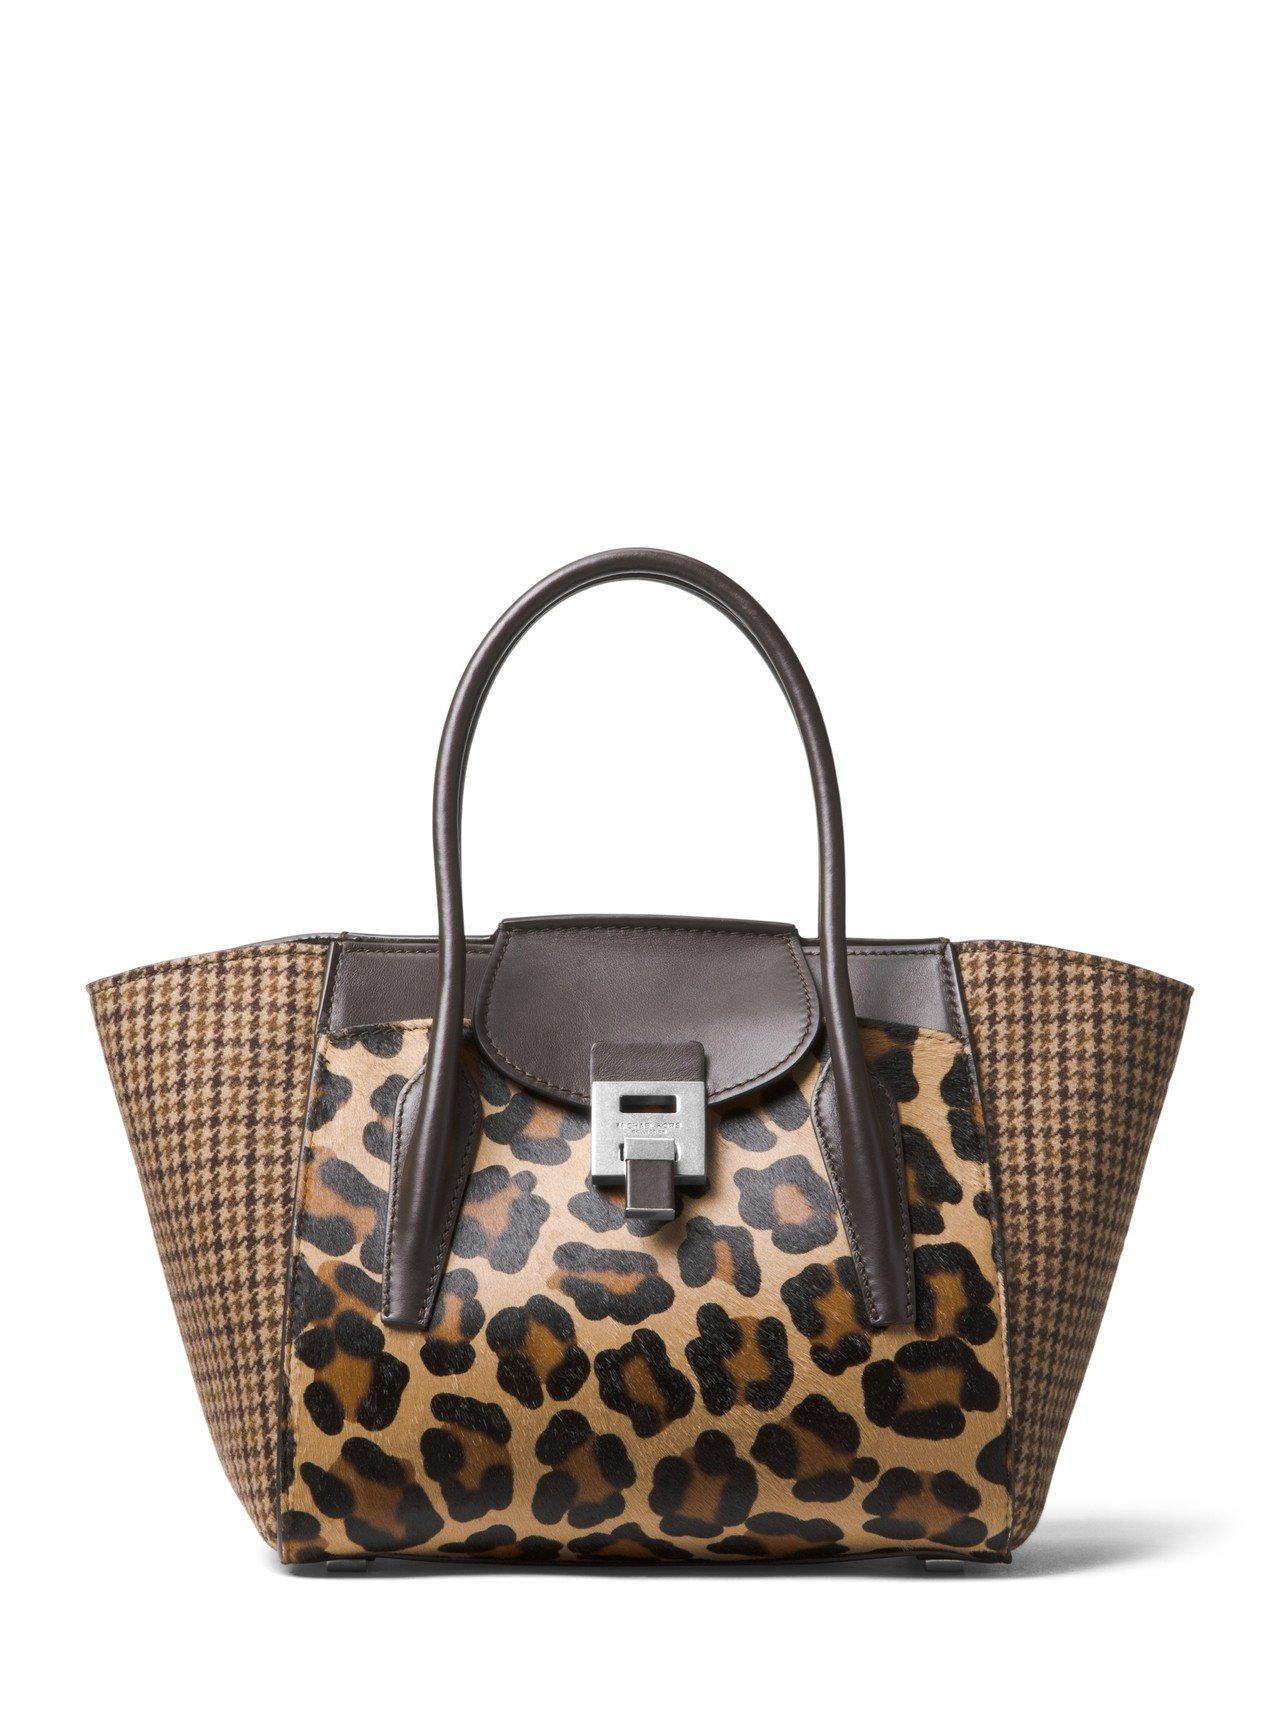 Bancroft豹紋駝色格紋拼接提包,售價48,900元。圖/MICHAEL K...